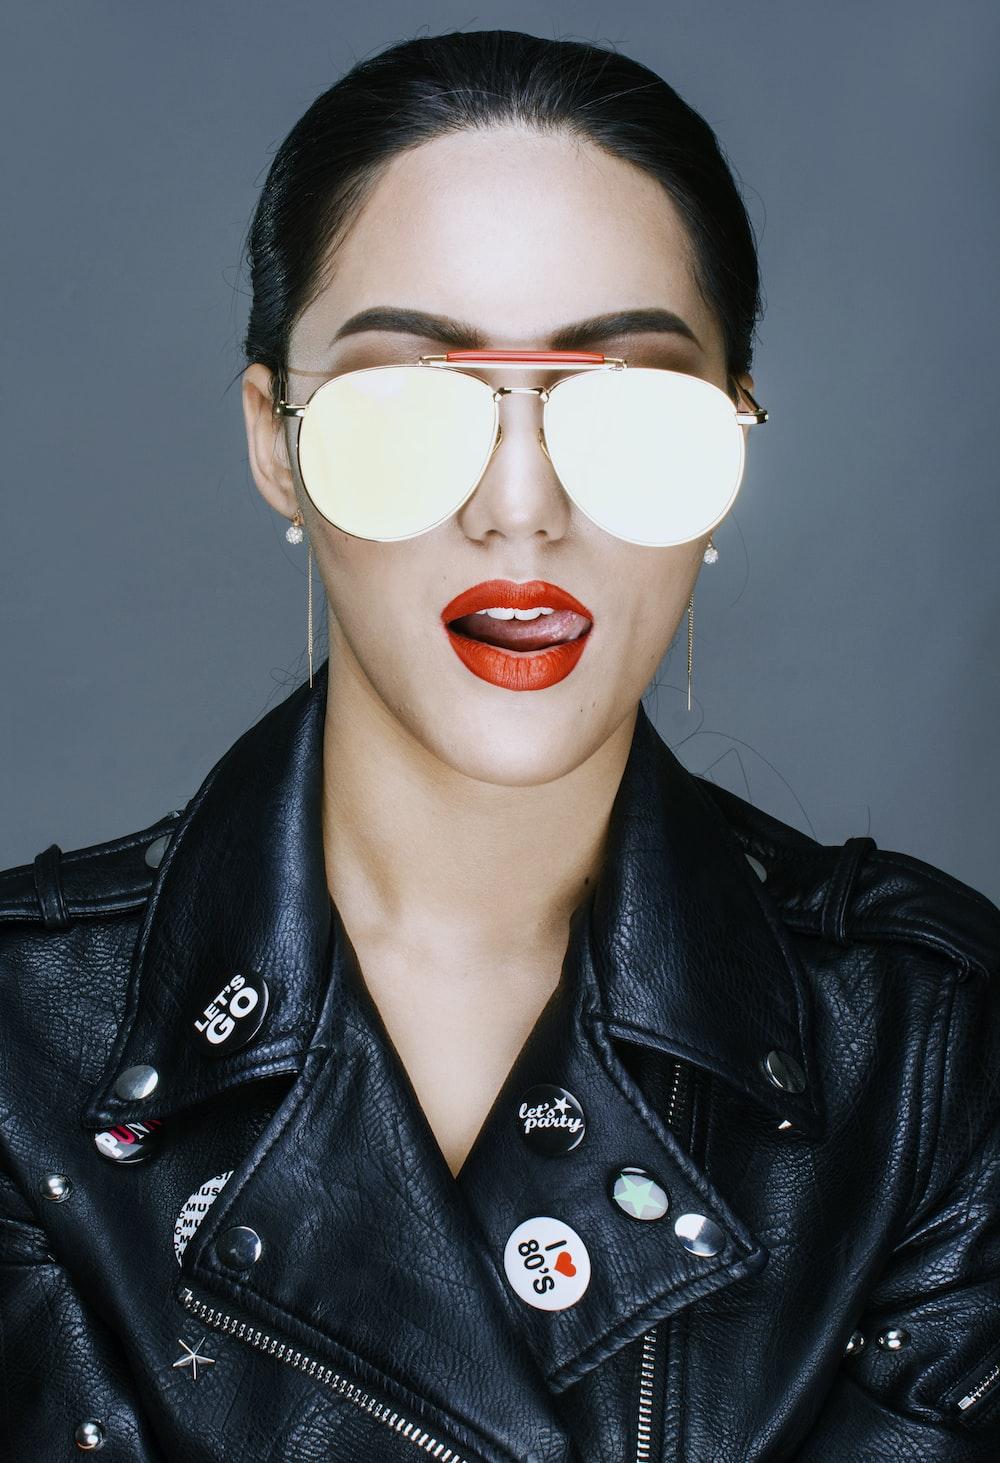 woman licking lips wearing black leather jacket